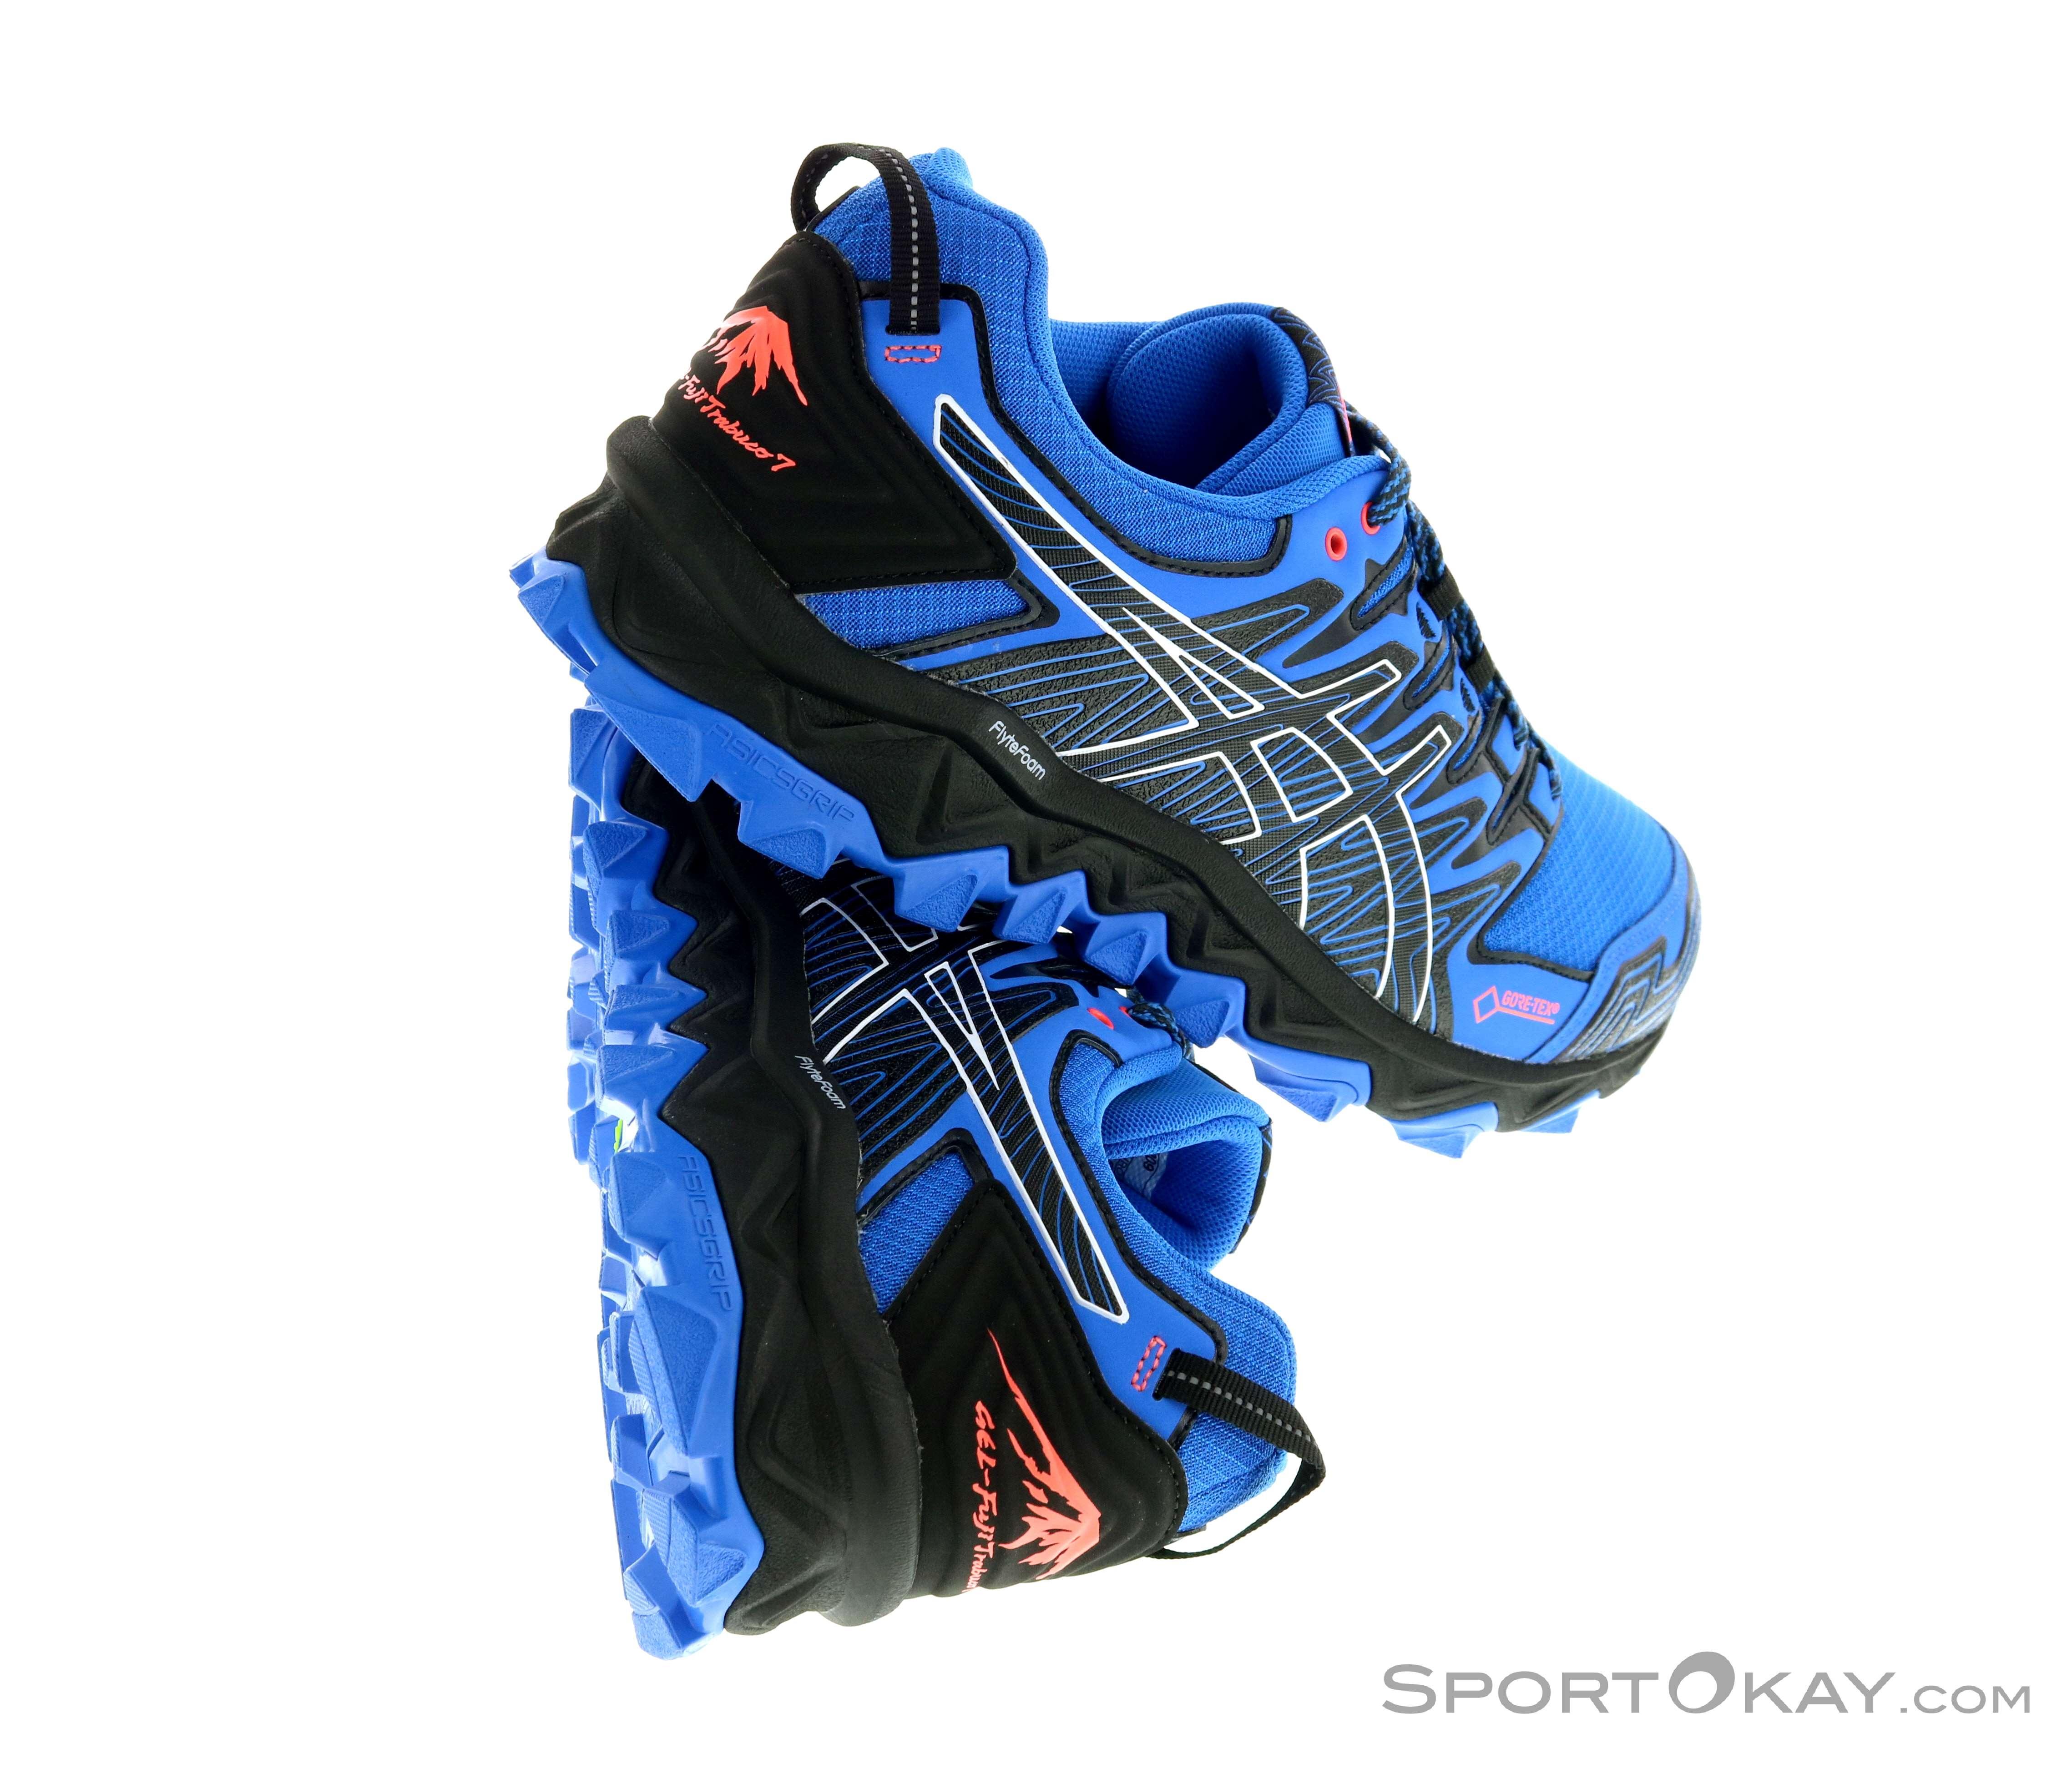 Asics Asics Fujitrabuco 7 GTX Mens Trail Running Shoes Gore Tex